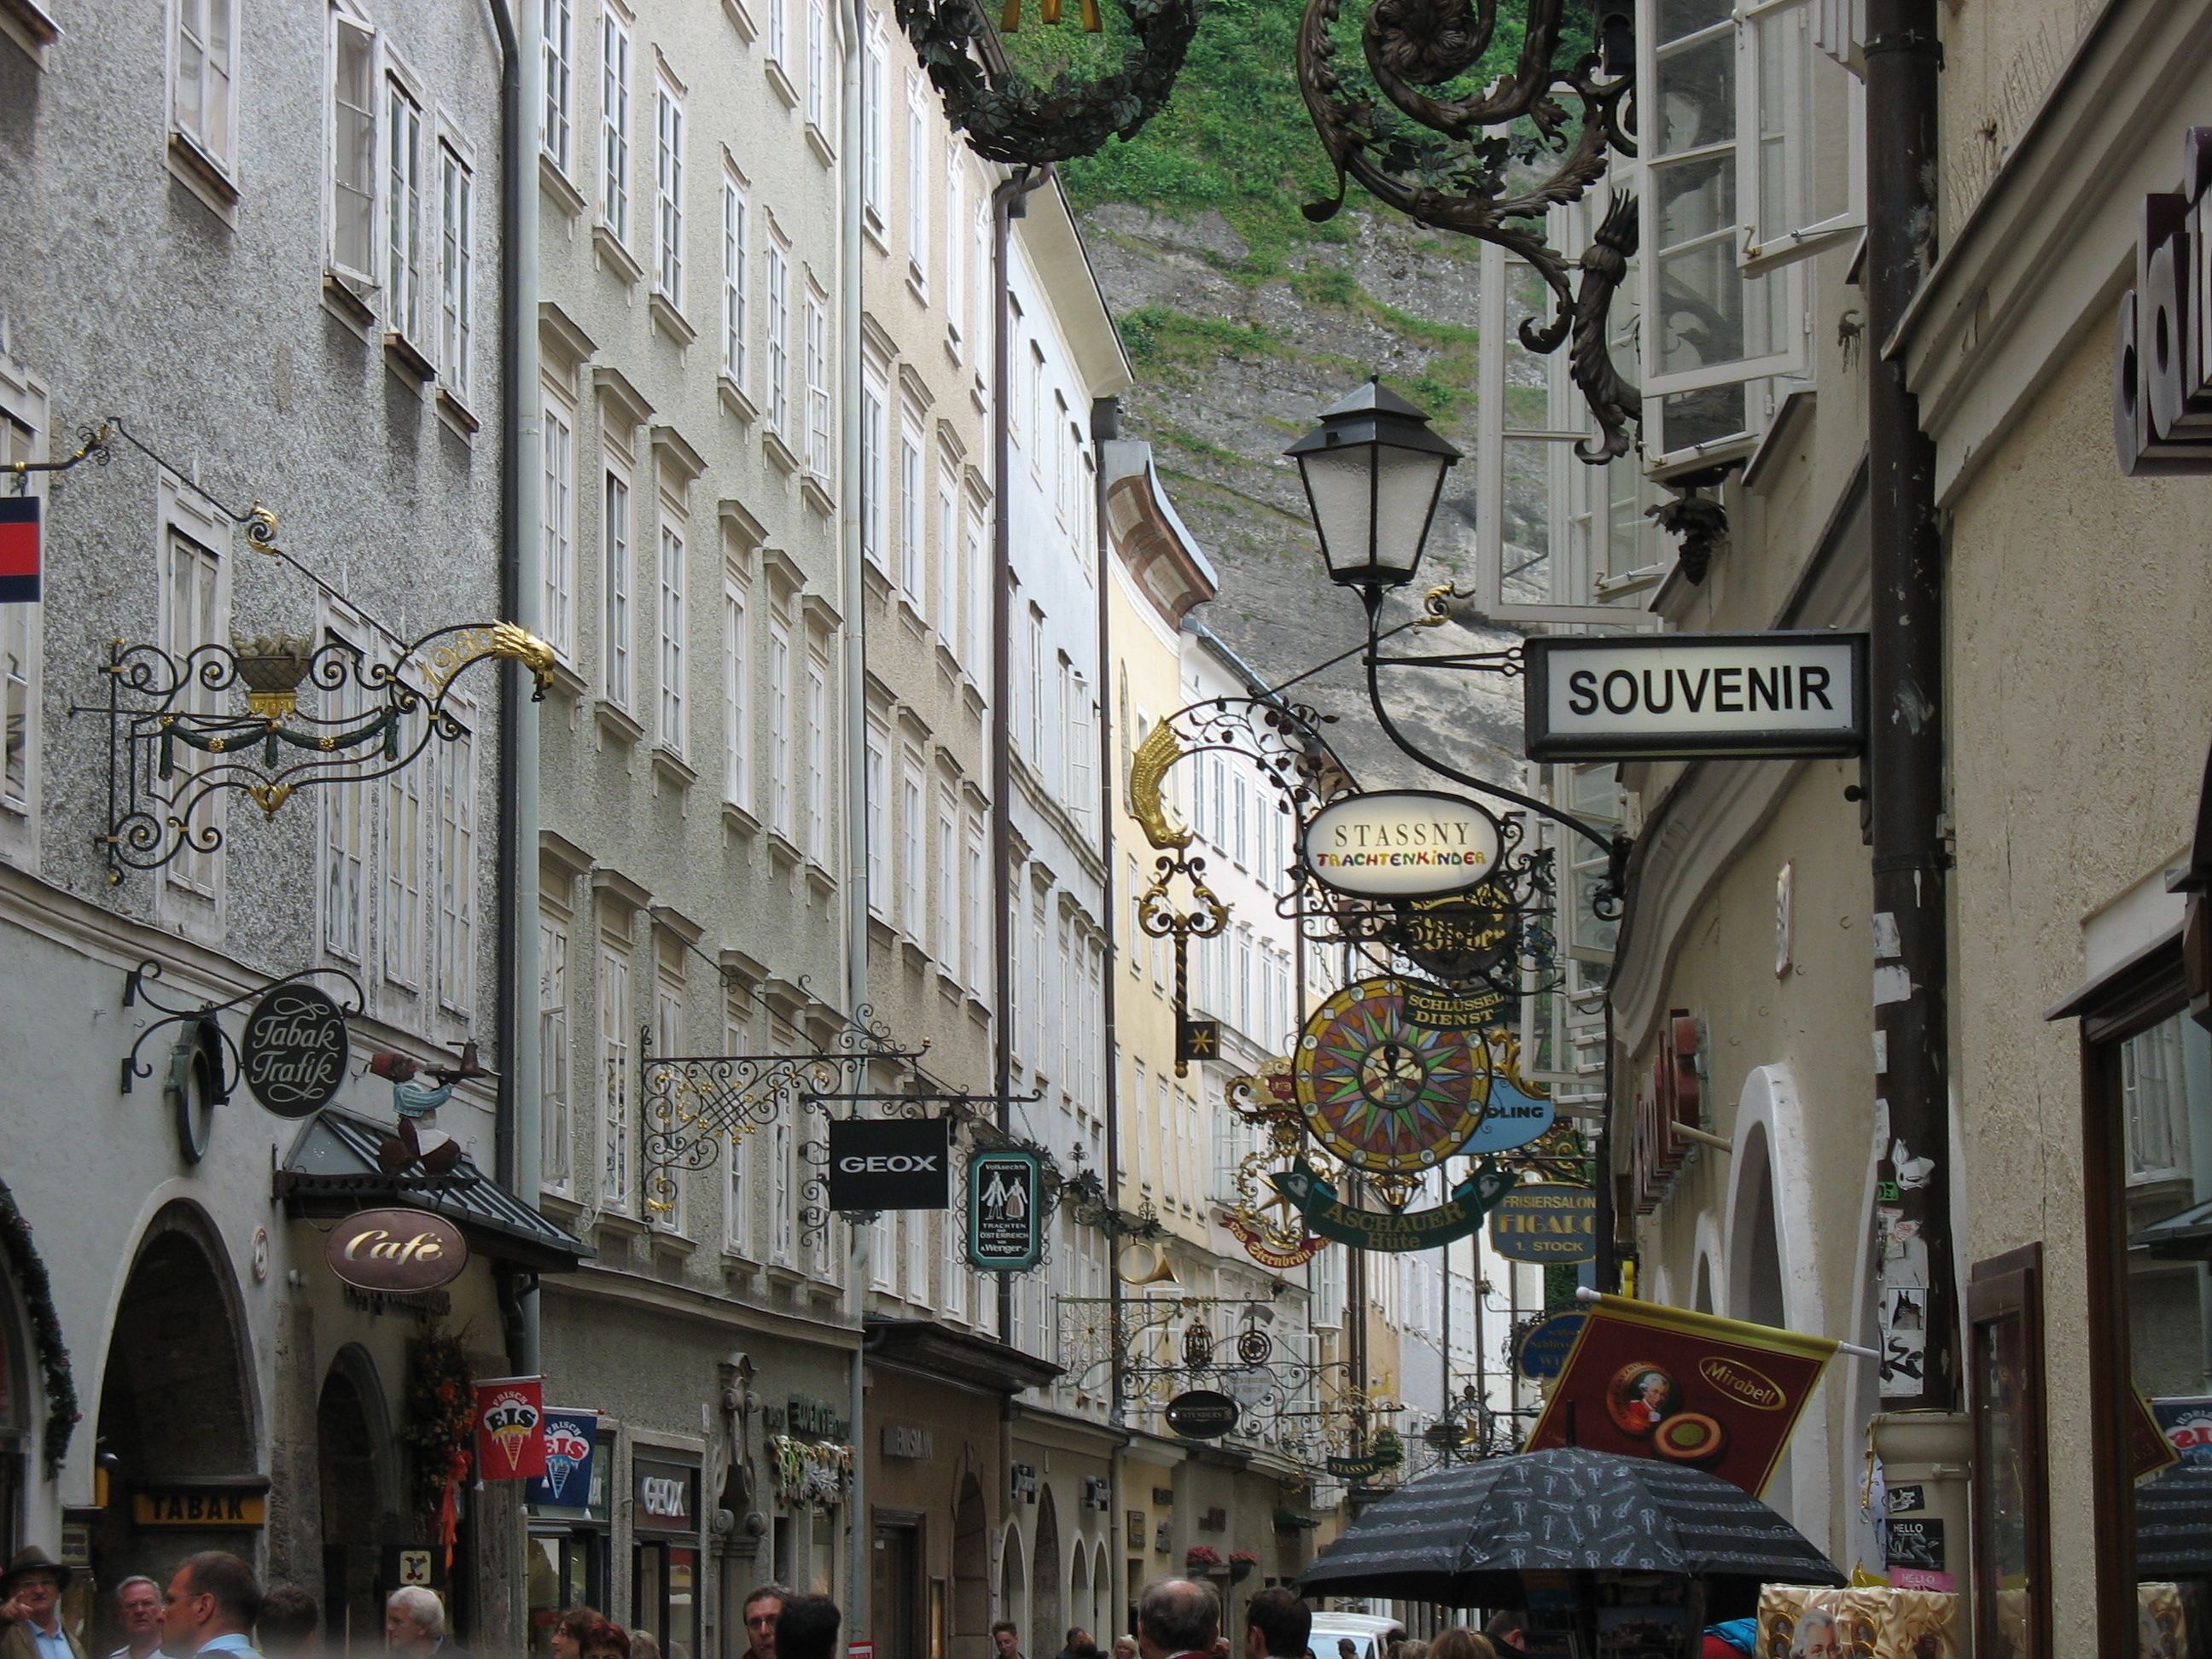 The Alstadt, the old quarter of Salzburg, Austria. Iconic